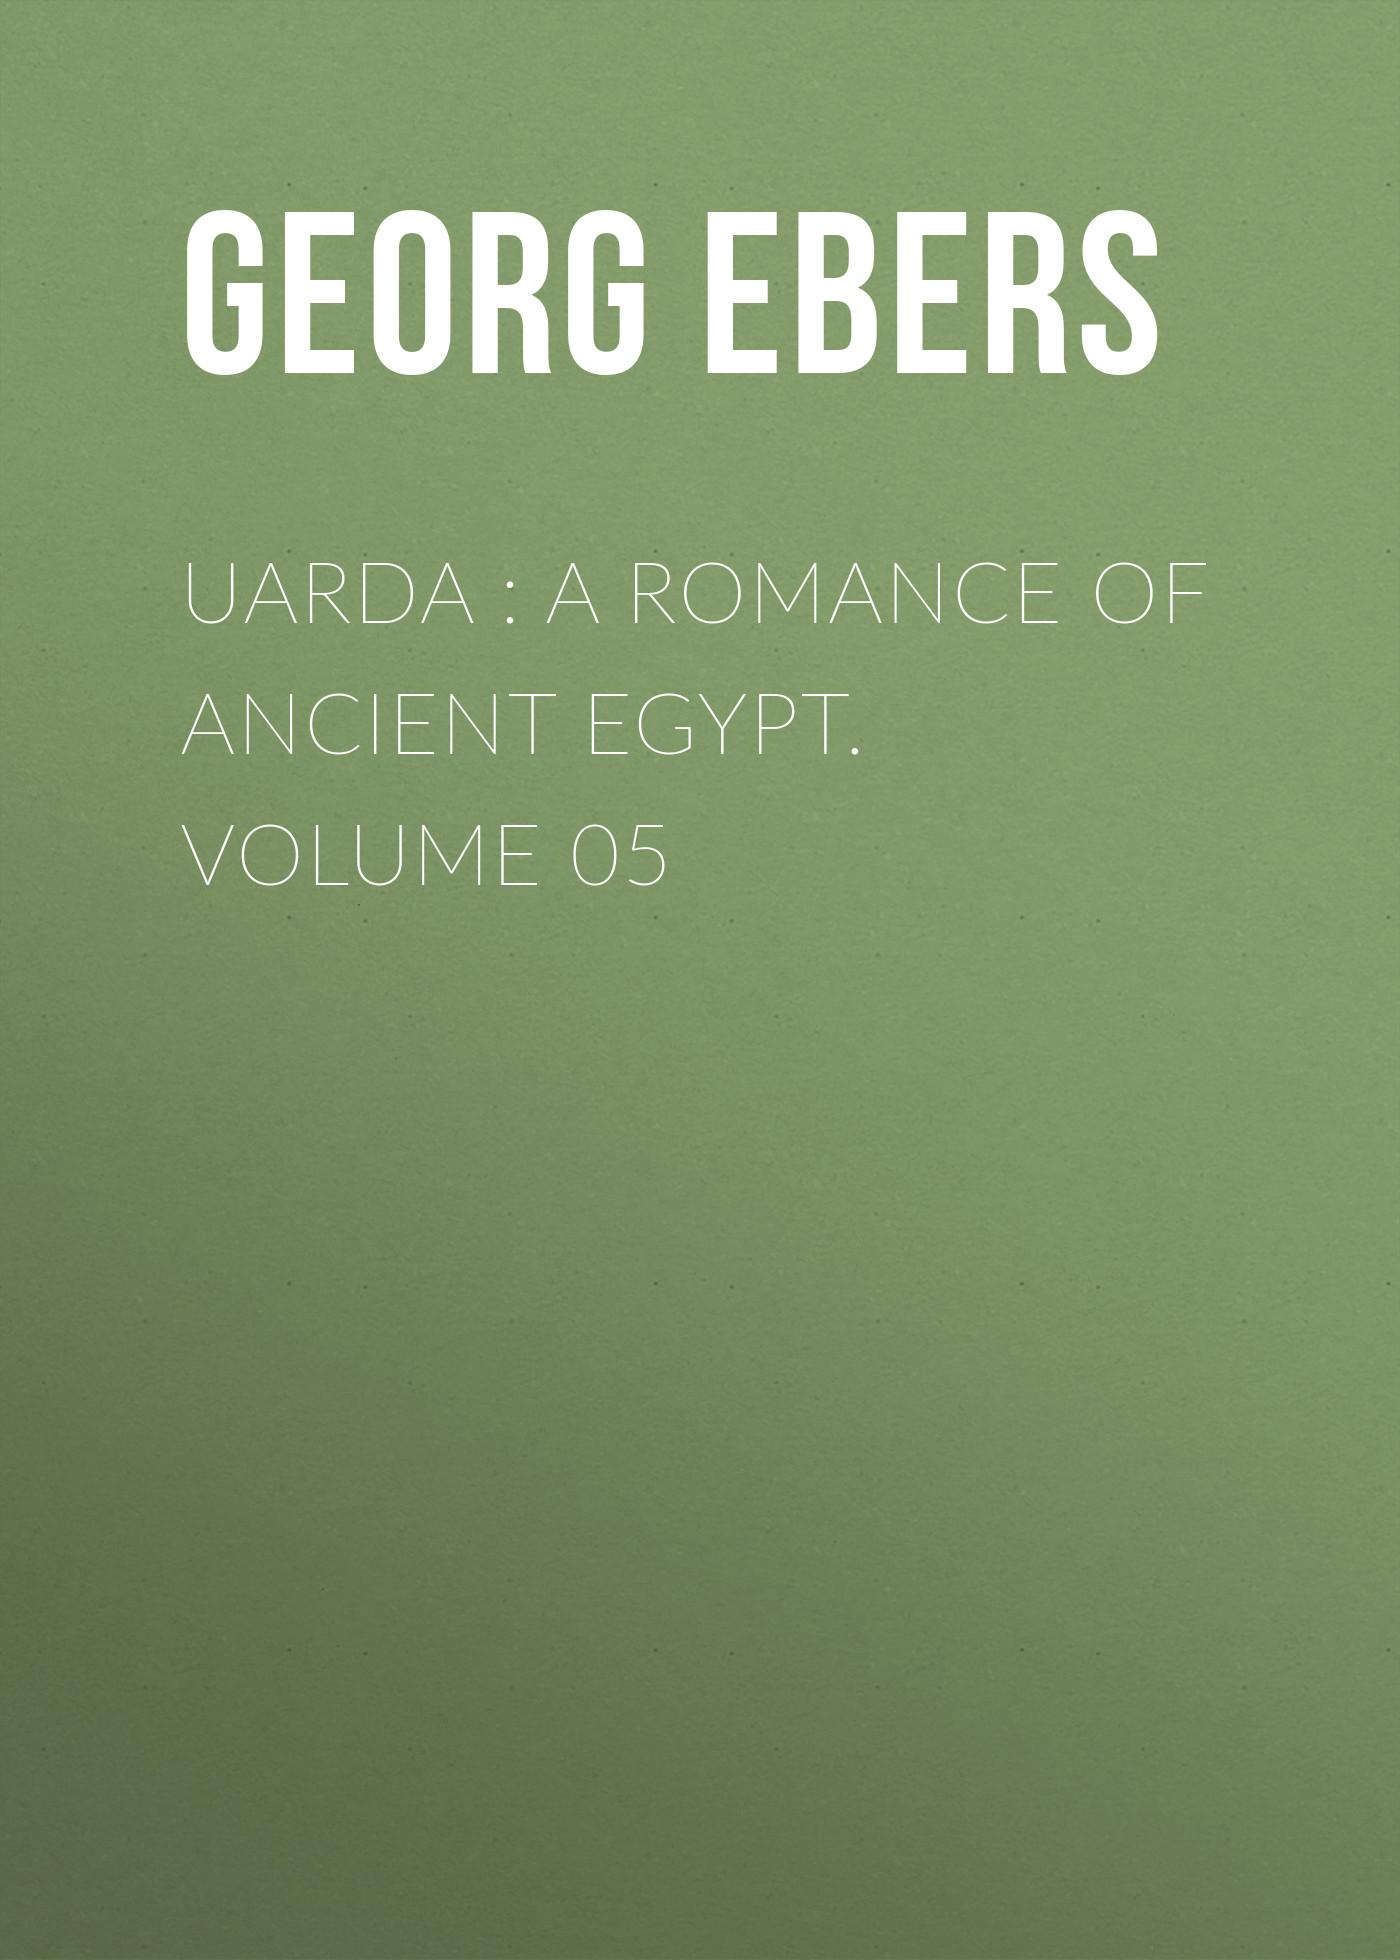 Georg Ebers Uarda : a Romance of Ancient Egypt. Volume 05 georg ebers homo sum volume 02